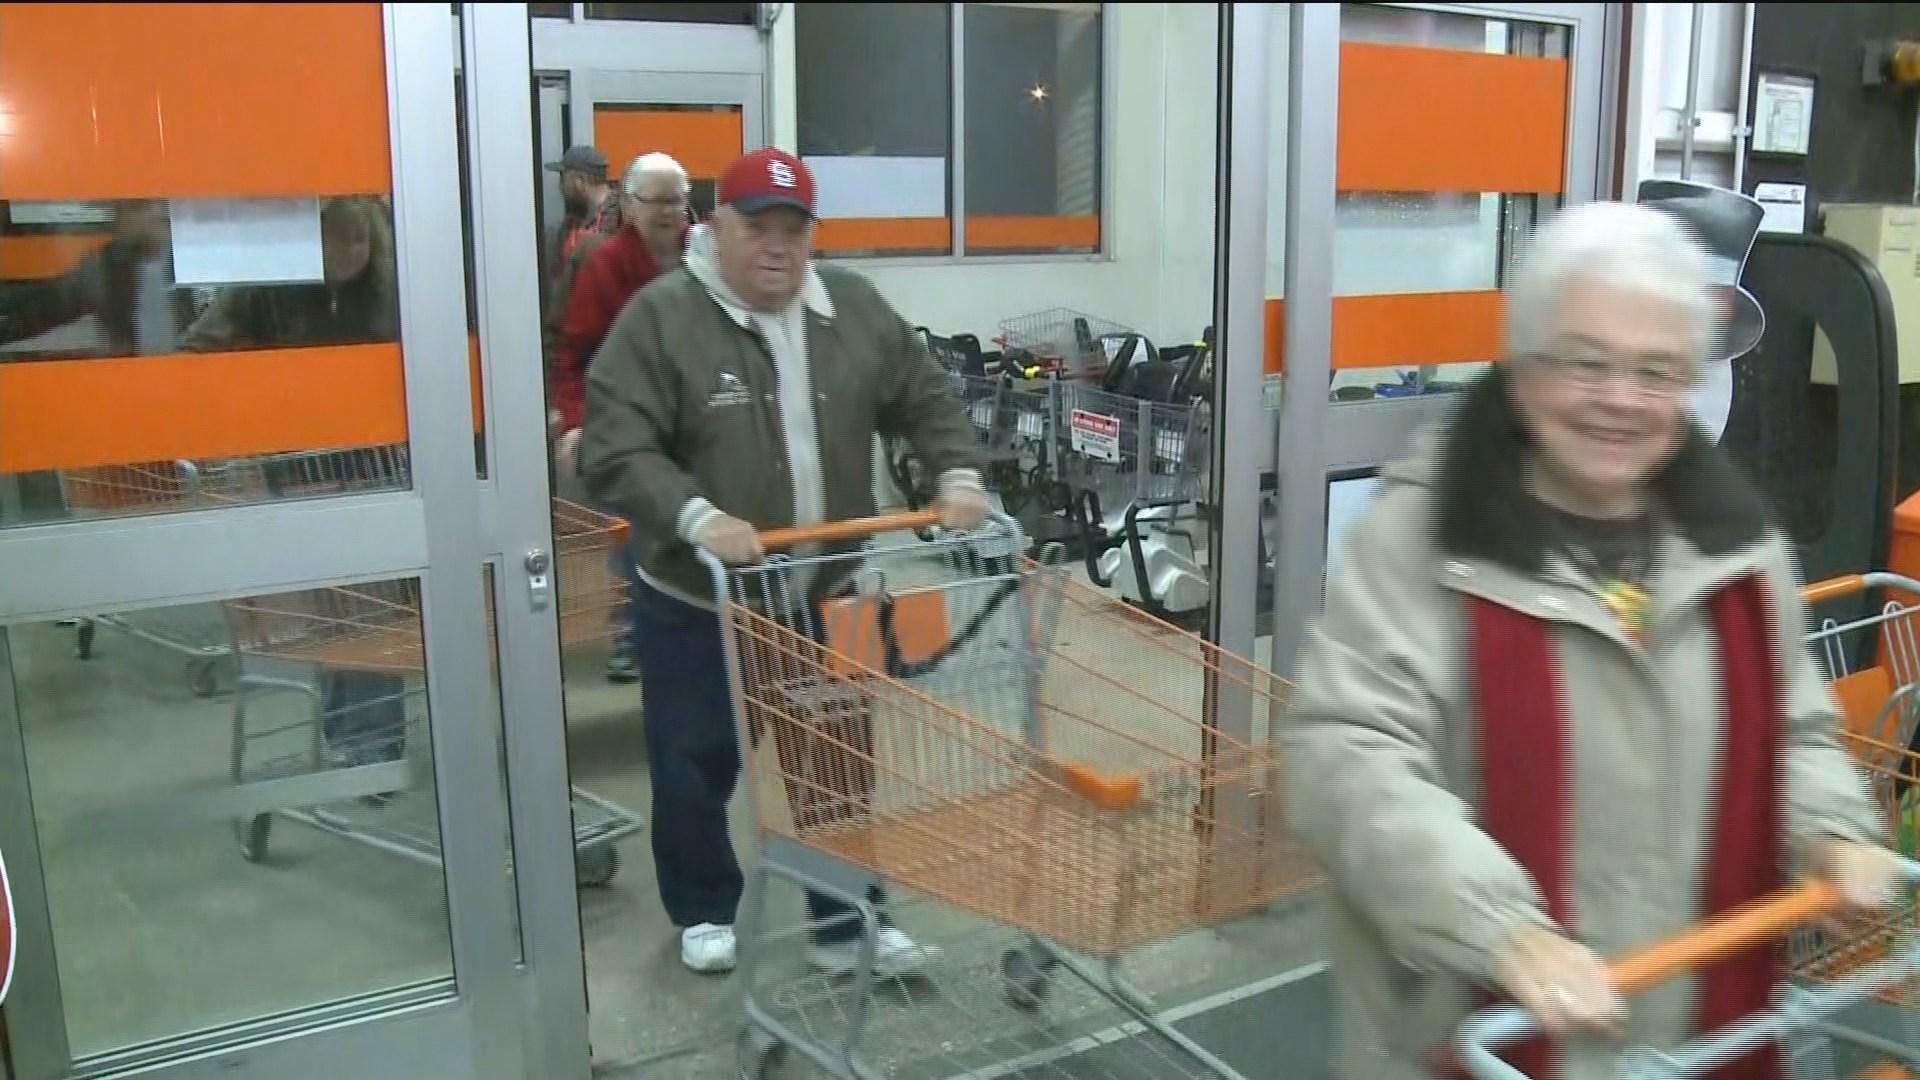 Shoppers race through doors at Home Depot